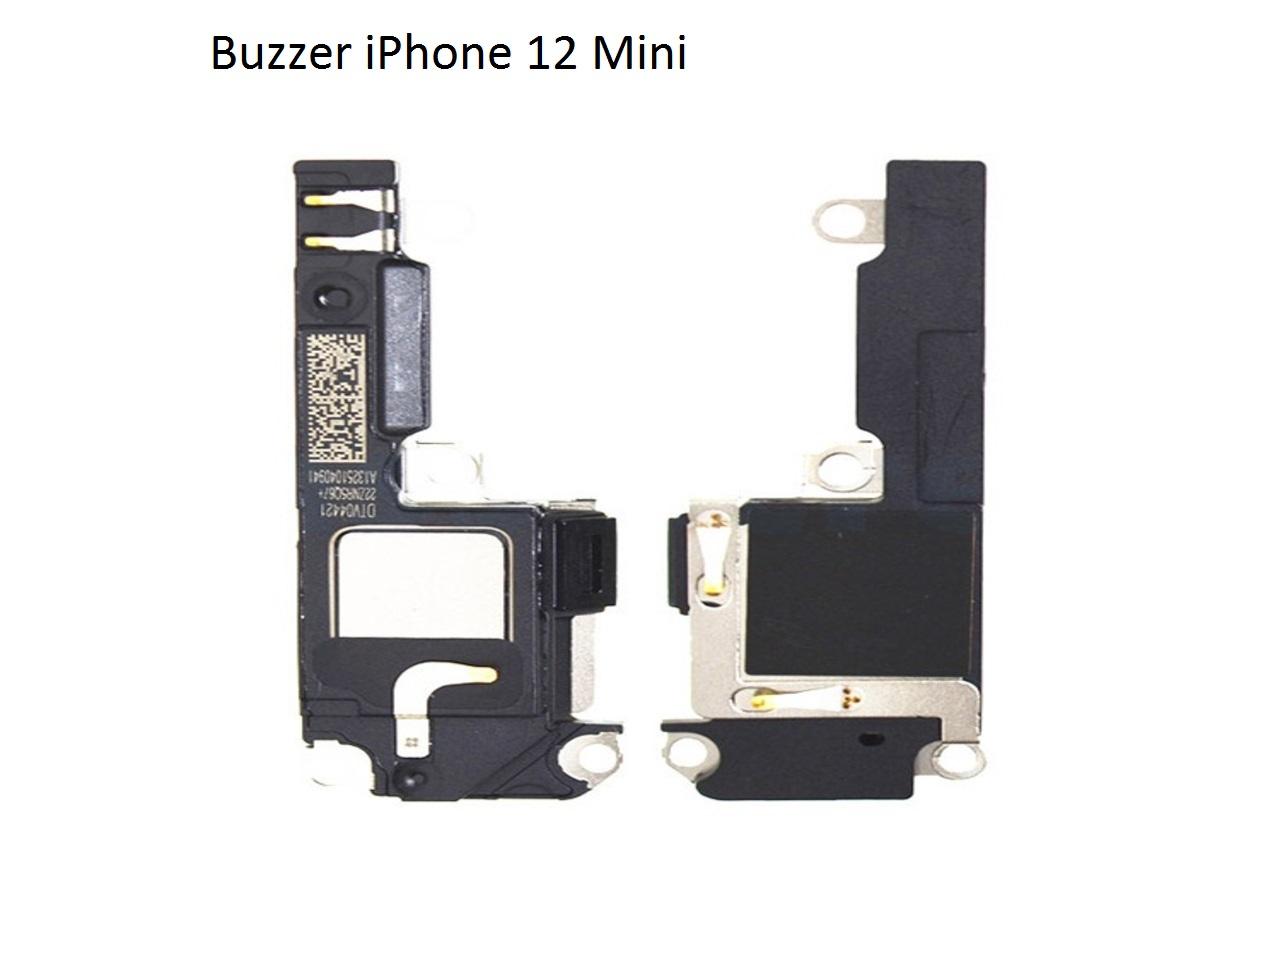 BUZZER-IPHONE-12-MINI